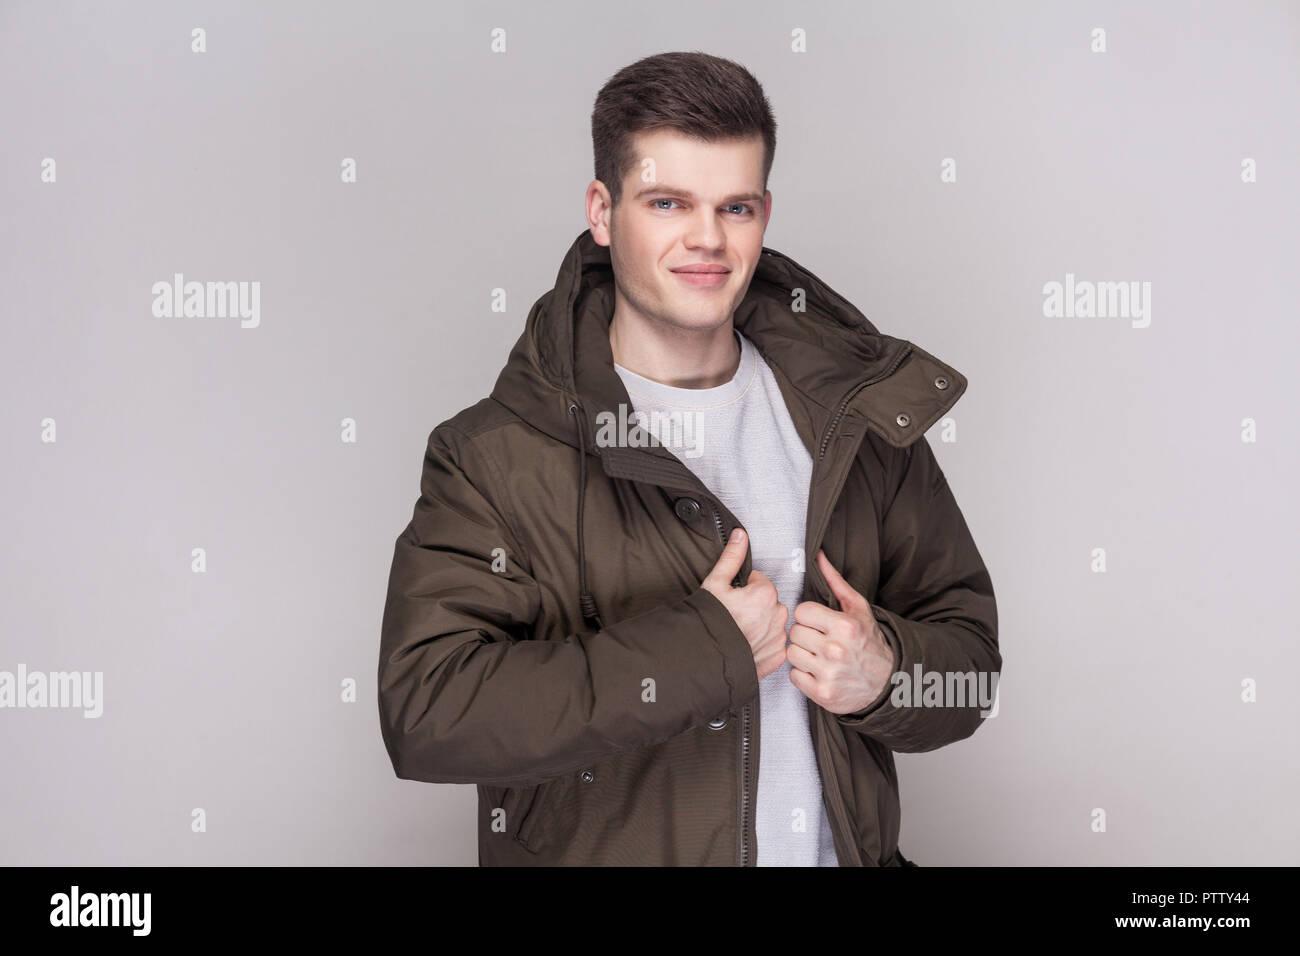 e285a0ba57a8 Porträt der jungen gutaussehenden Mann in Hellgrau Shirt und dunkelgrüne  Parka an Kamera mit Lächeln und